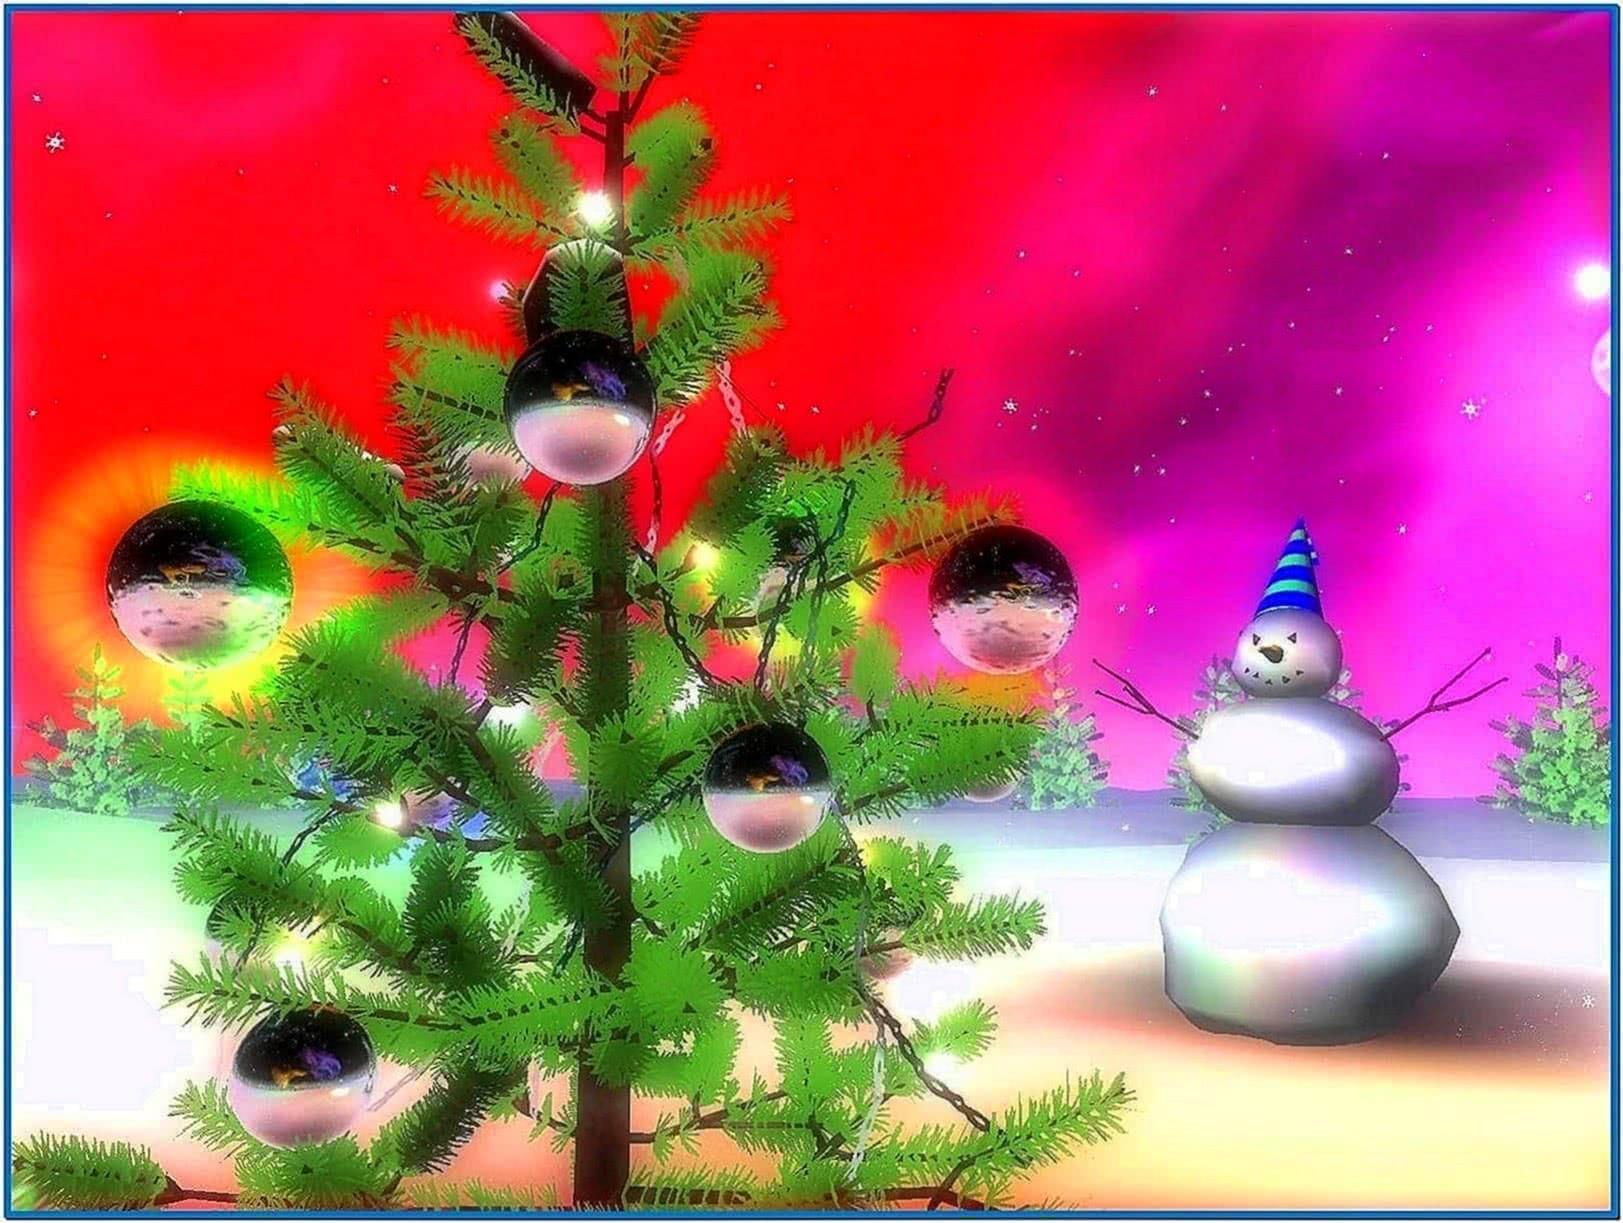 7art Christmas Magic 3D Screensaver